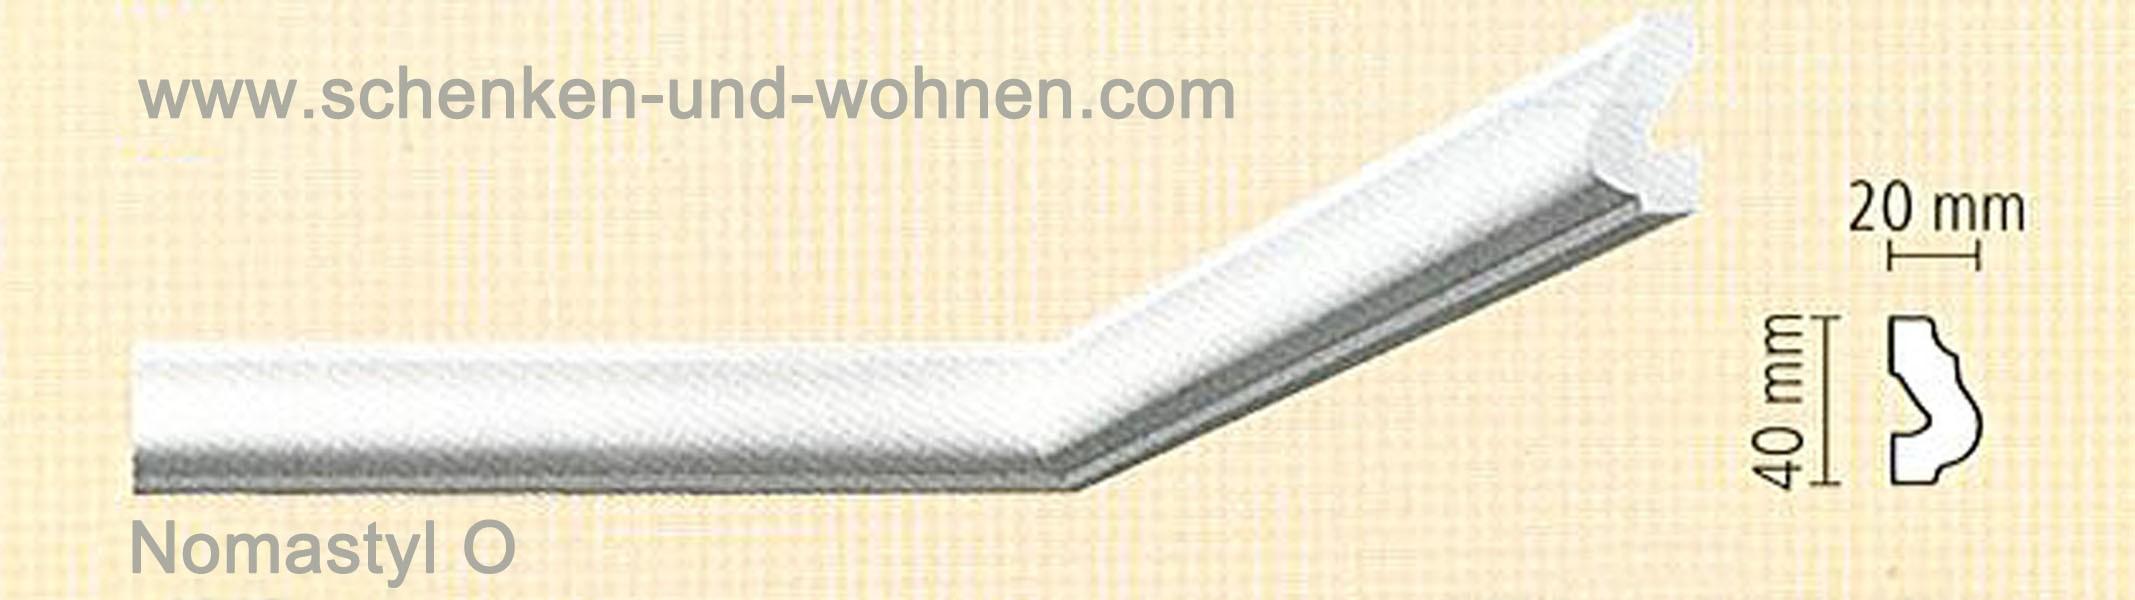 Nomastyl Flachprofil O 2m